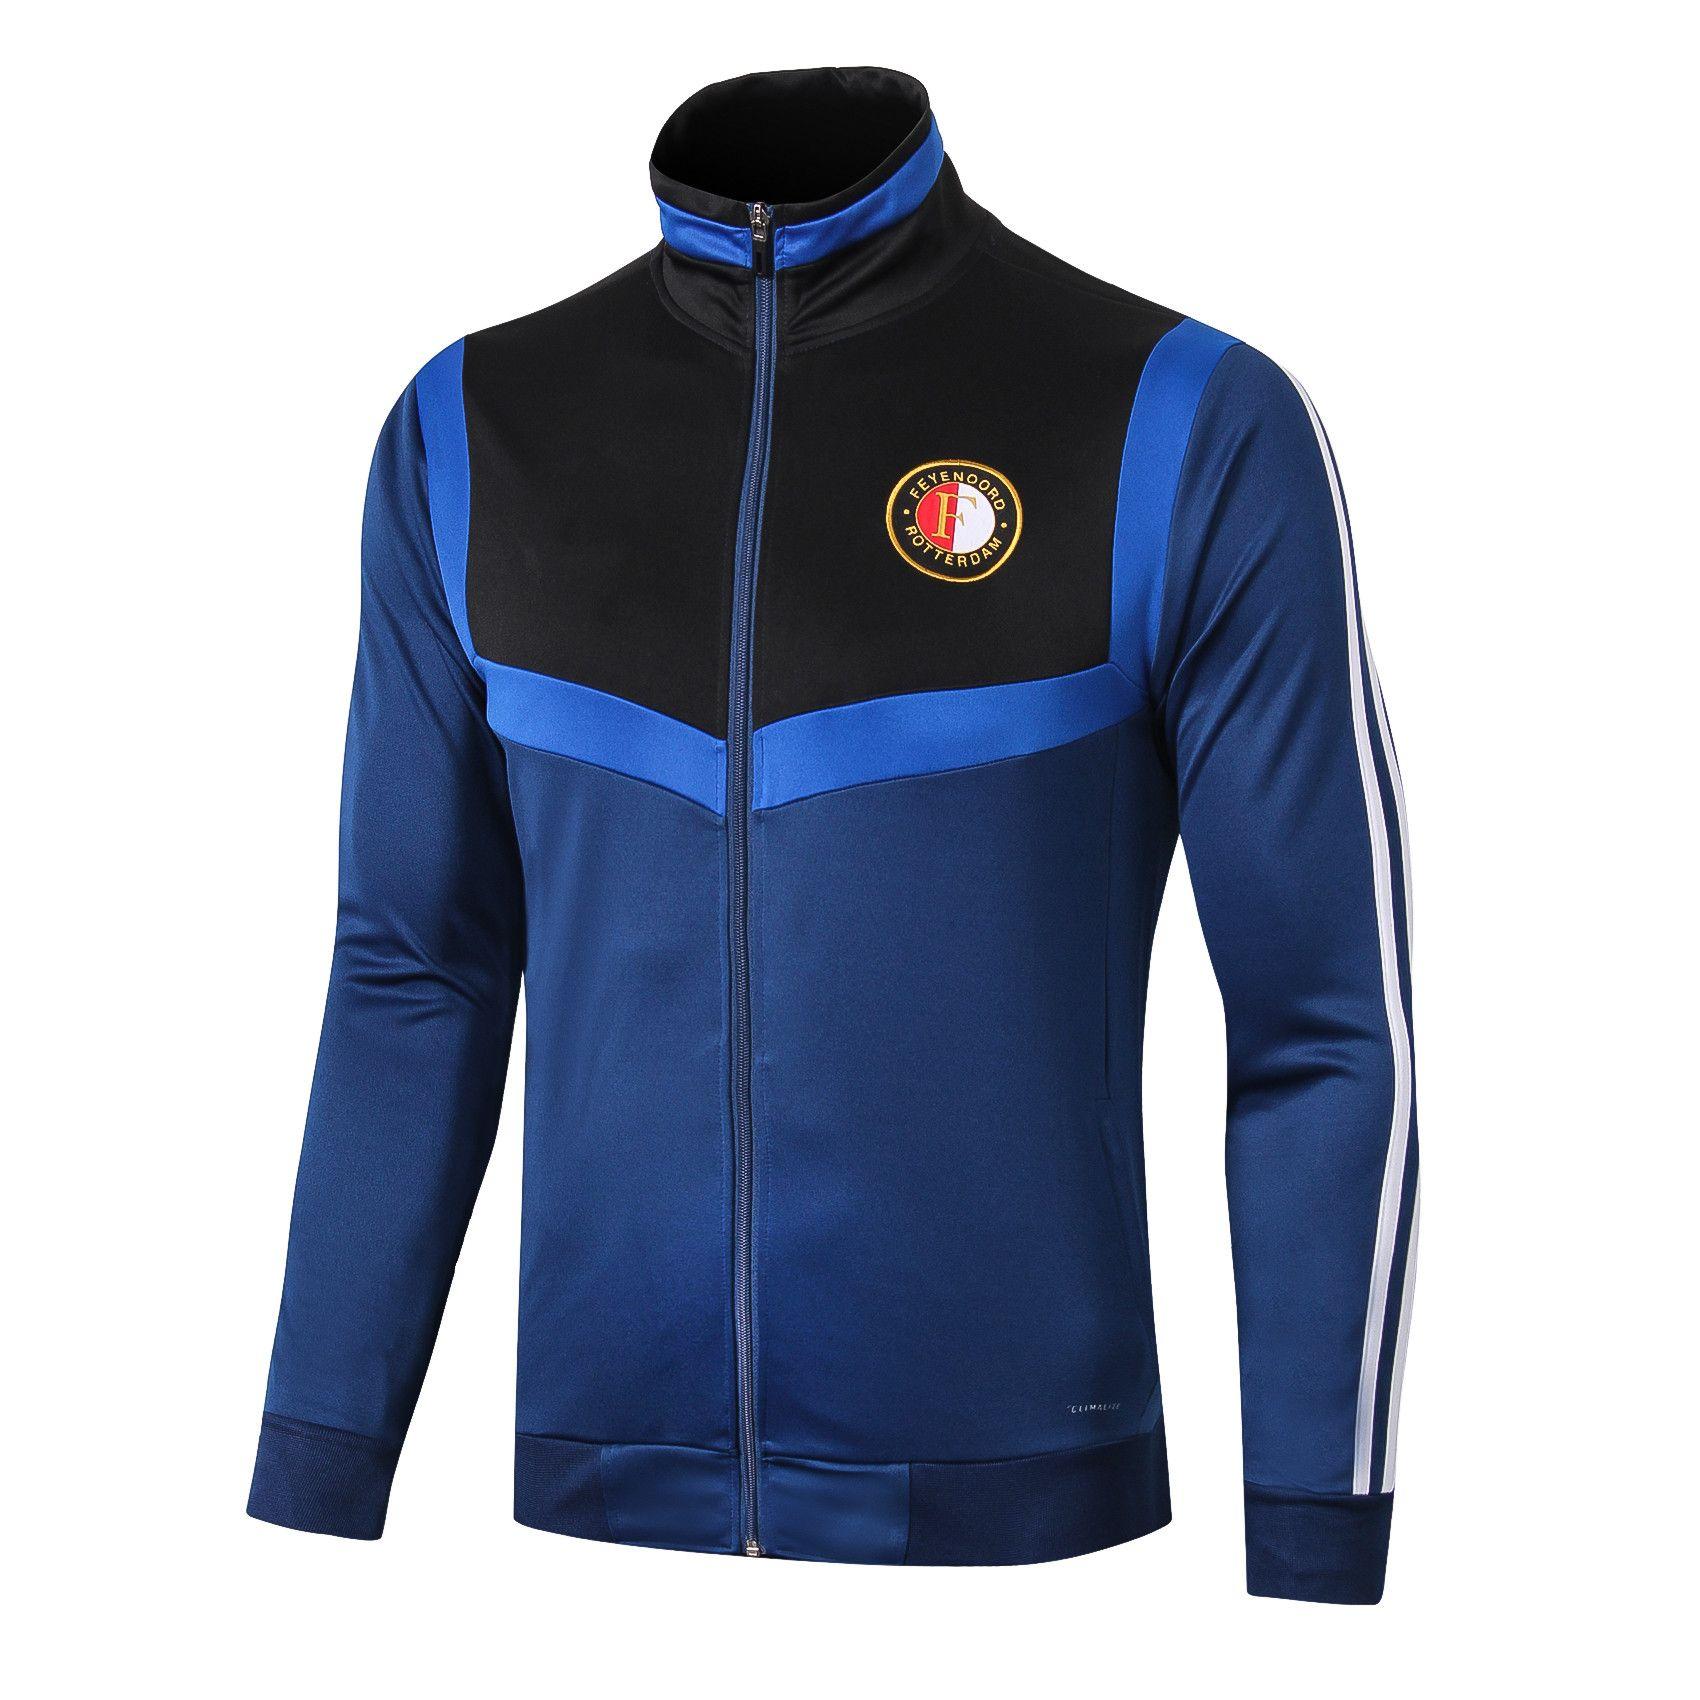 grosshandel 2019 2020 feyenoord rotterdam fussball trainingsanzug jacke voetbalshirt 19 20 feyenoord fussball trainingsanzug von global top shop 60 06